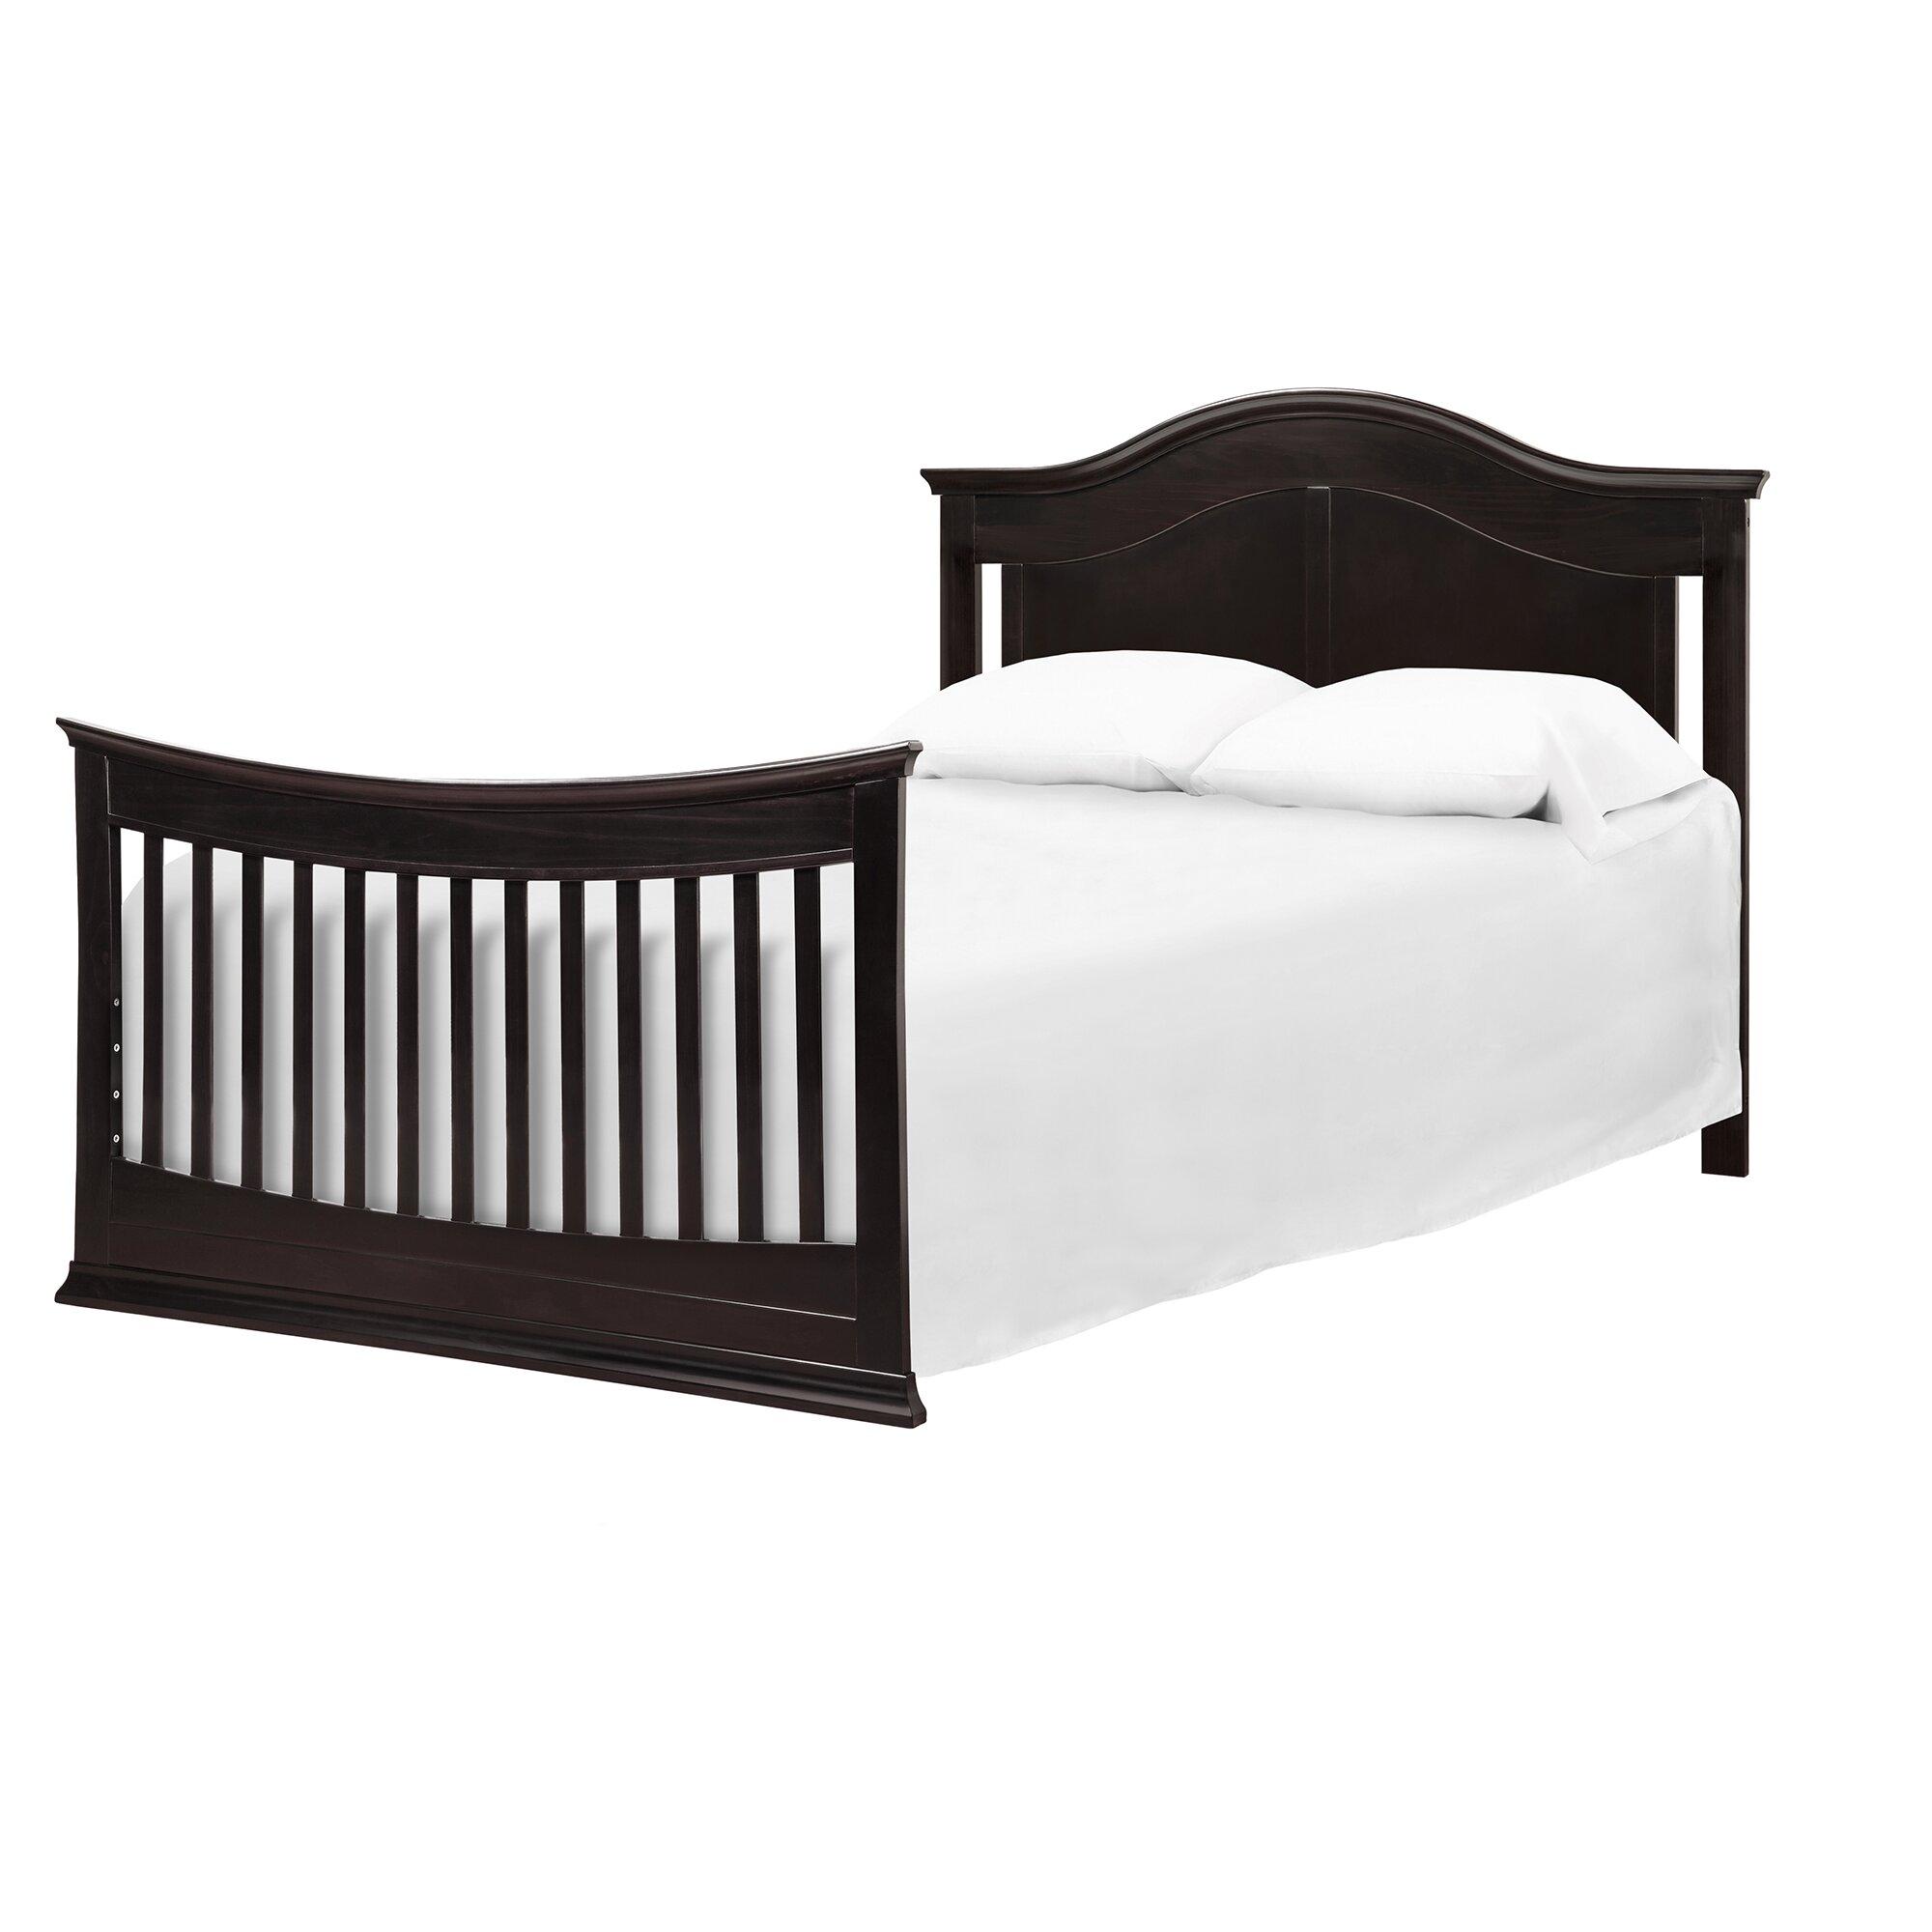 DaVinci Meadow 4-in-1 Convertible Crib & Reviews | Wayfair